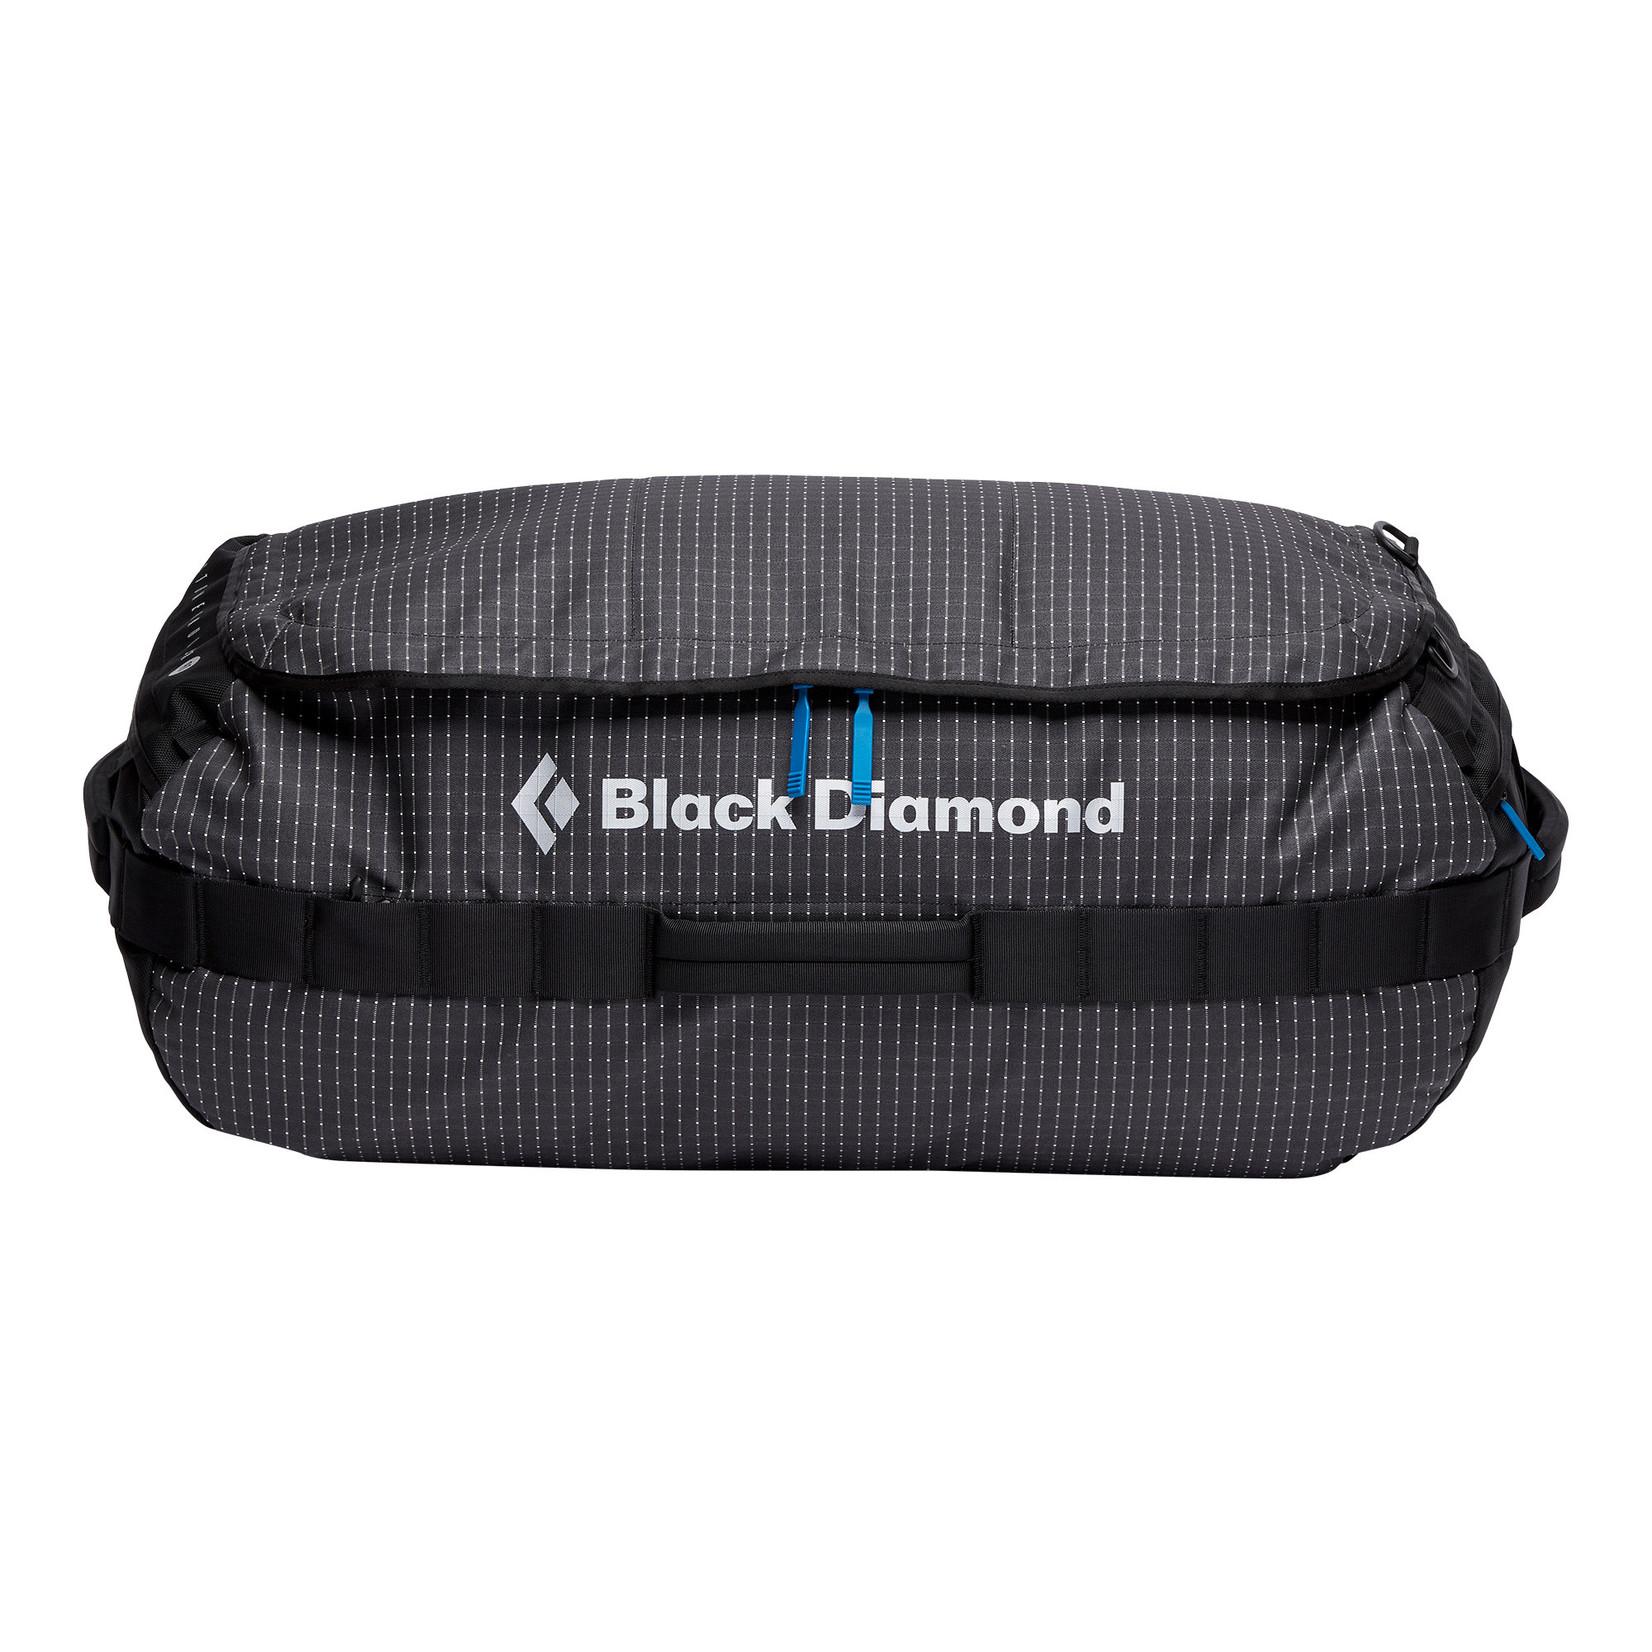 Black Diamond Black Diamond Stonehauler 90 L Duffel